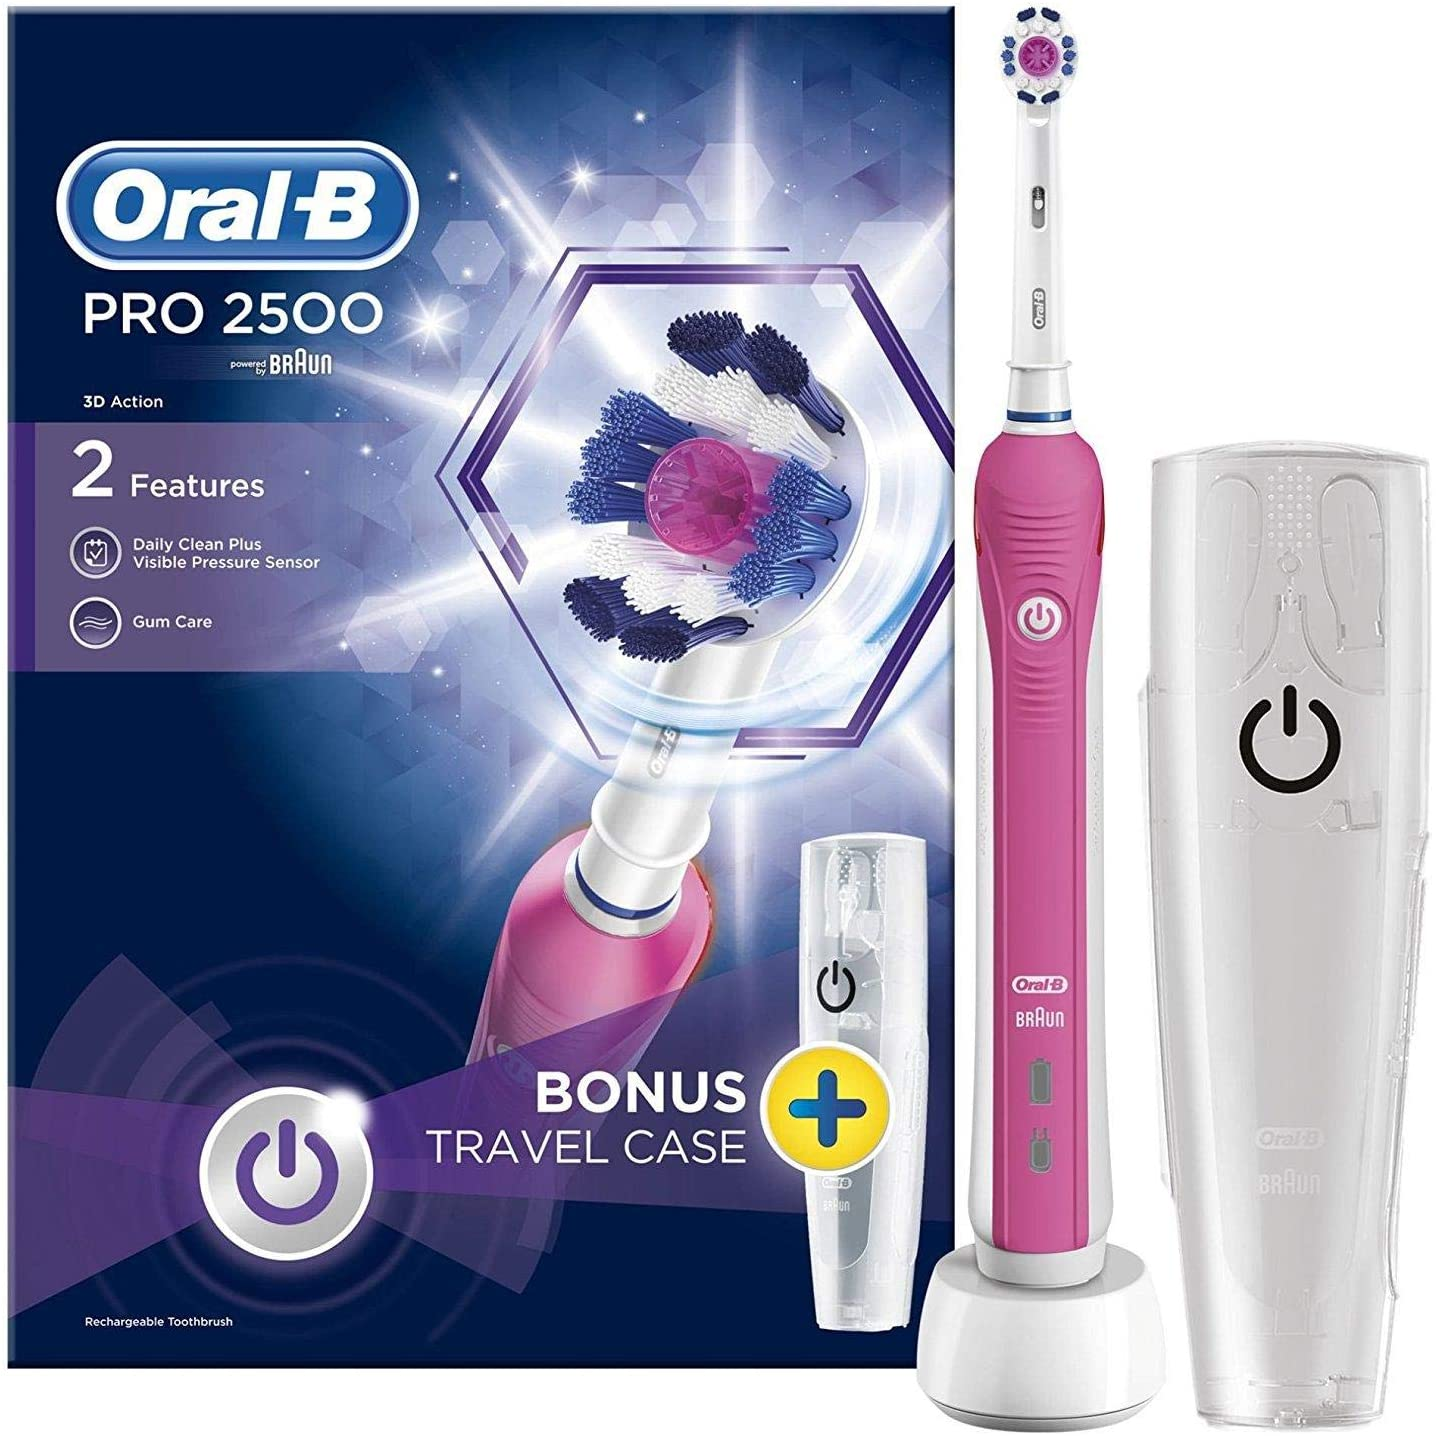 Oral B Pro 2500 3d White Electric Rechargeable Toothbrush With Travel Case Powered By Braun Pink أوفردوز التسوق أونلاين في السعودية Offerdos